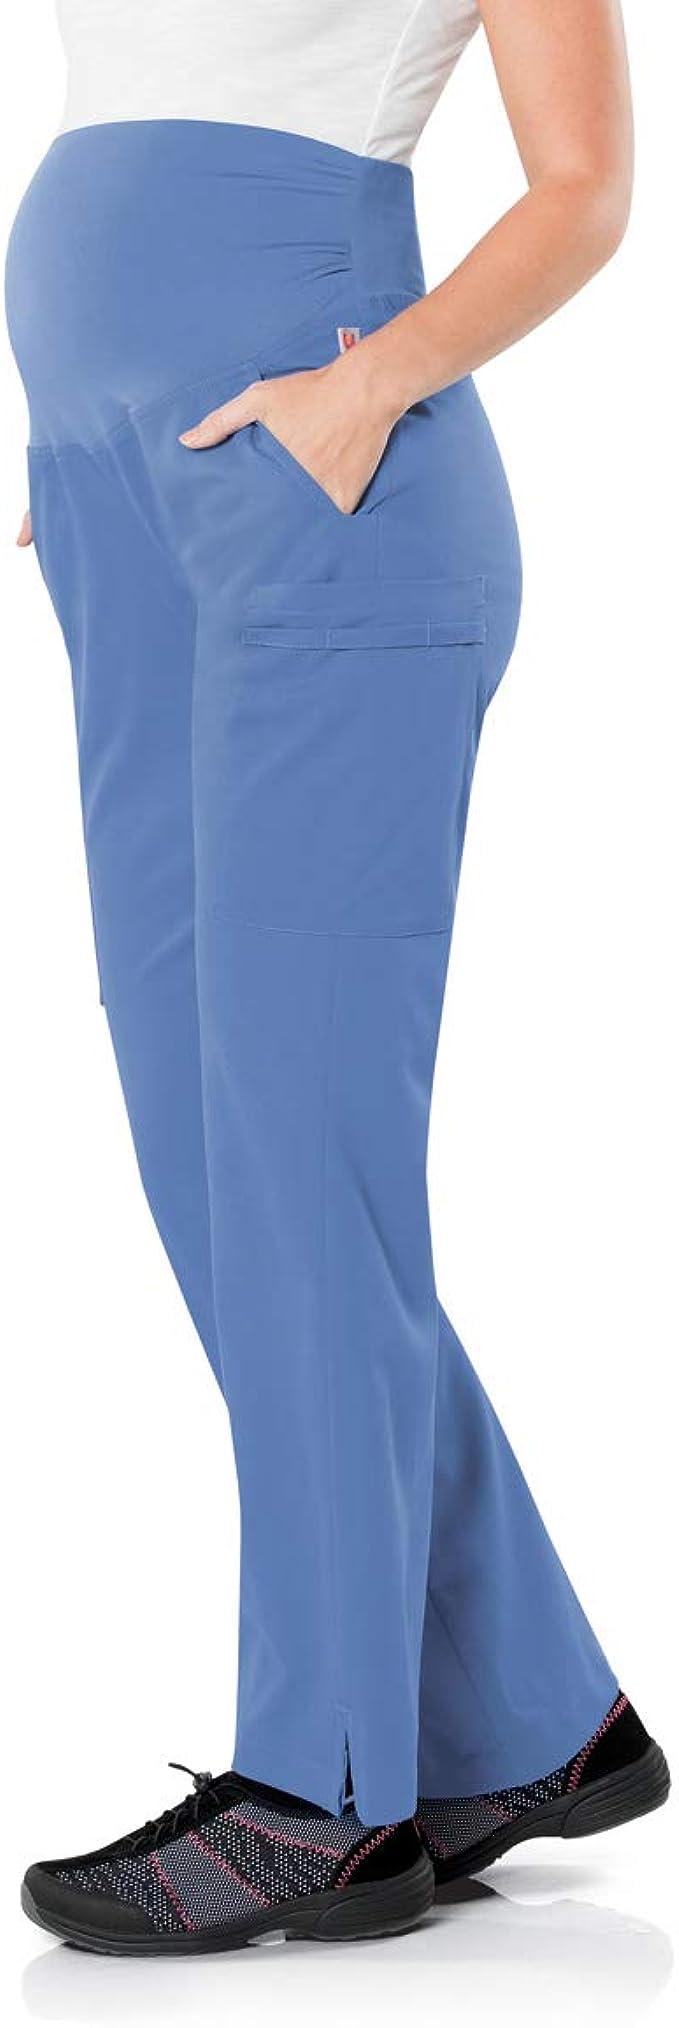 Royal Urbane Womens Maternity Scrub Pant-Stretchy Waistband with 4 Pockets XSM